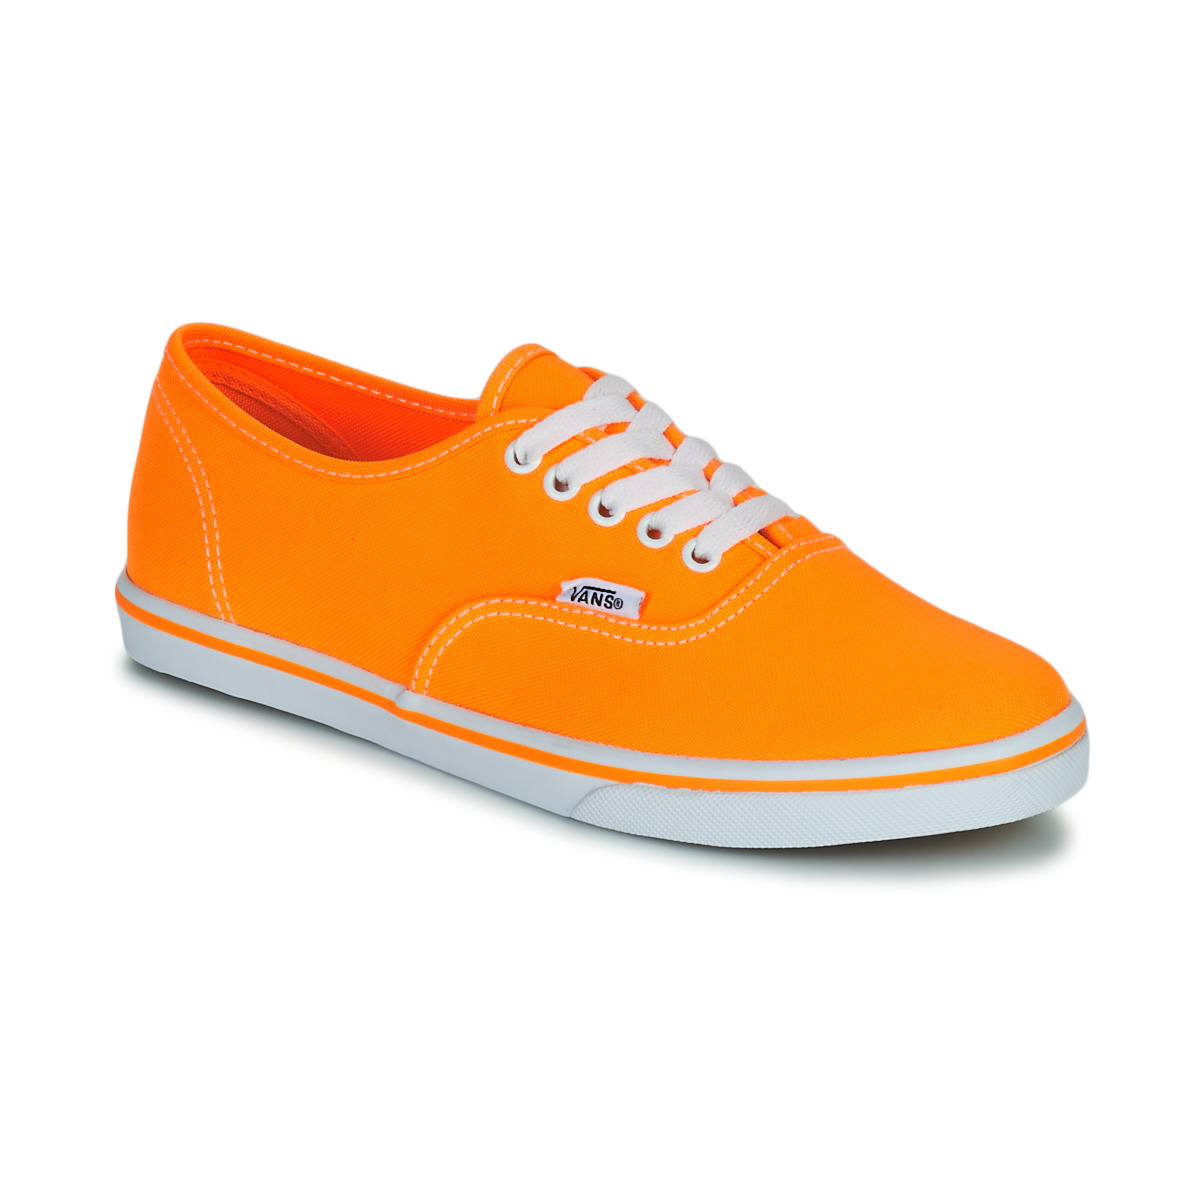 Vans AUTHENTIC LO PRO Orange pop